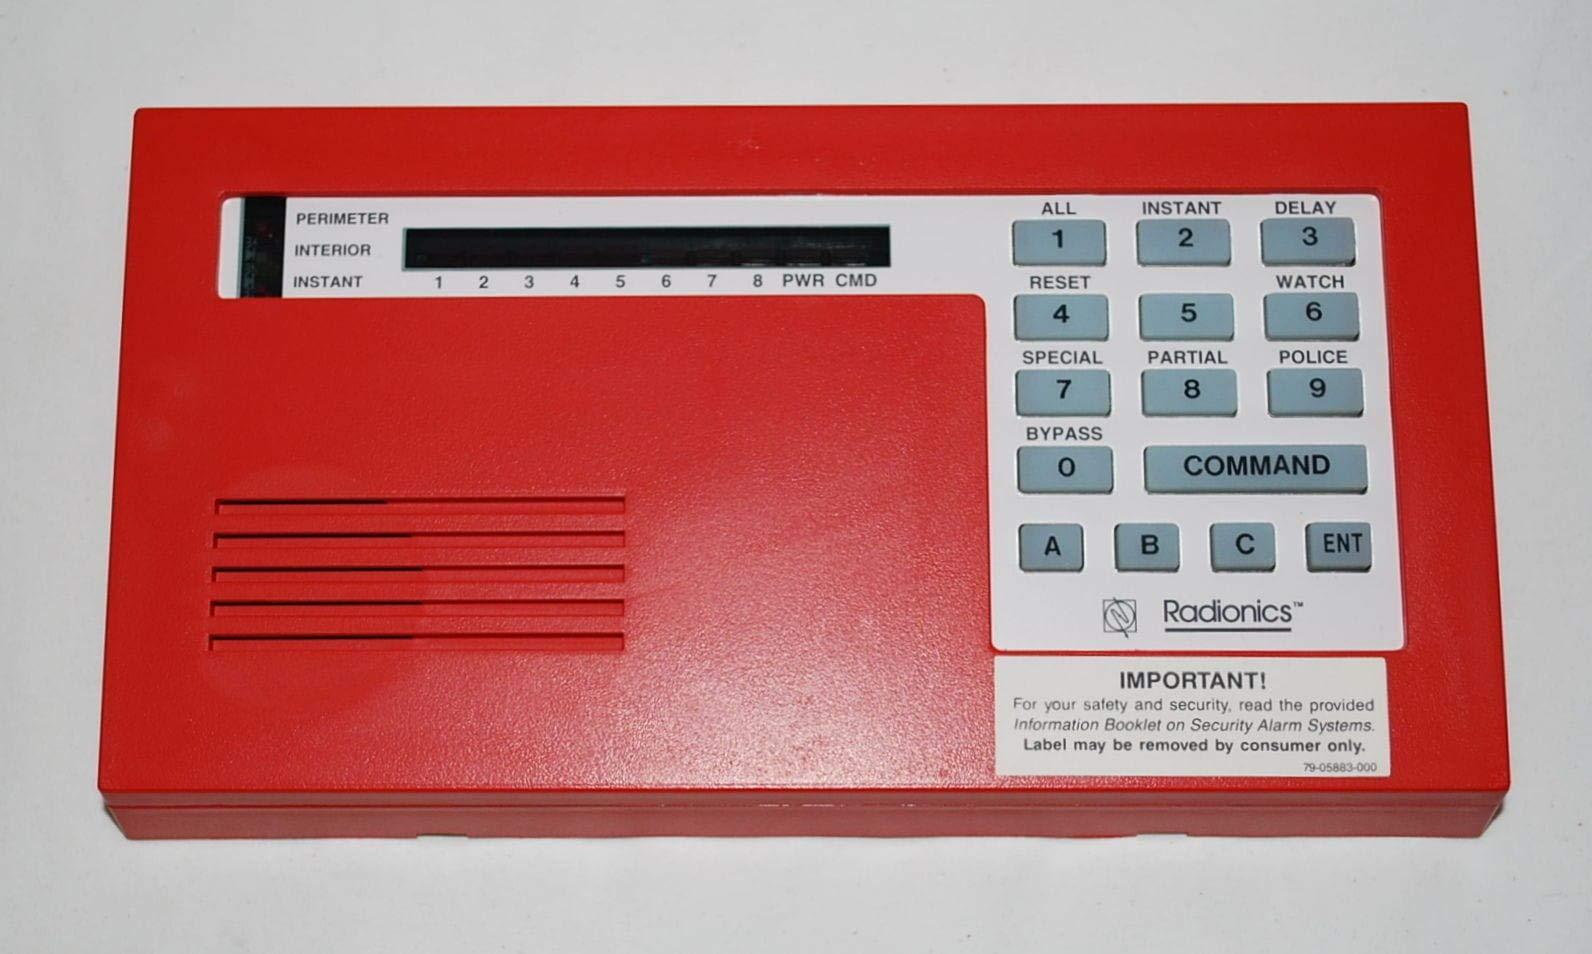 Radionics D720 by firealarm